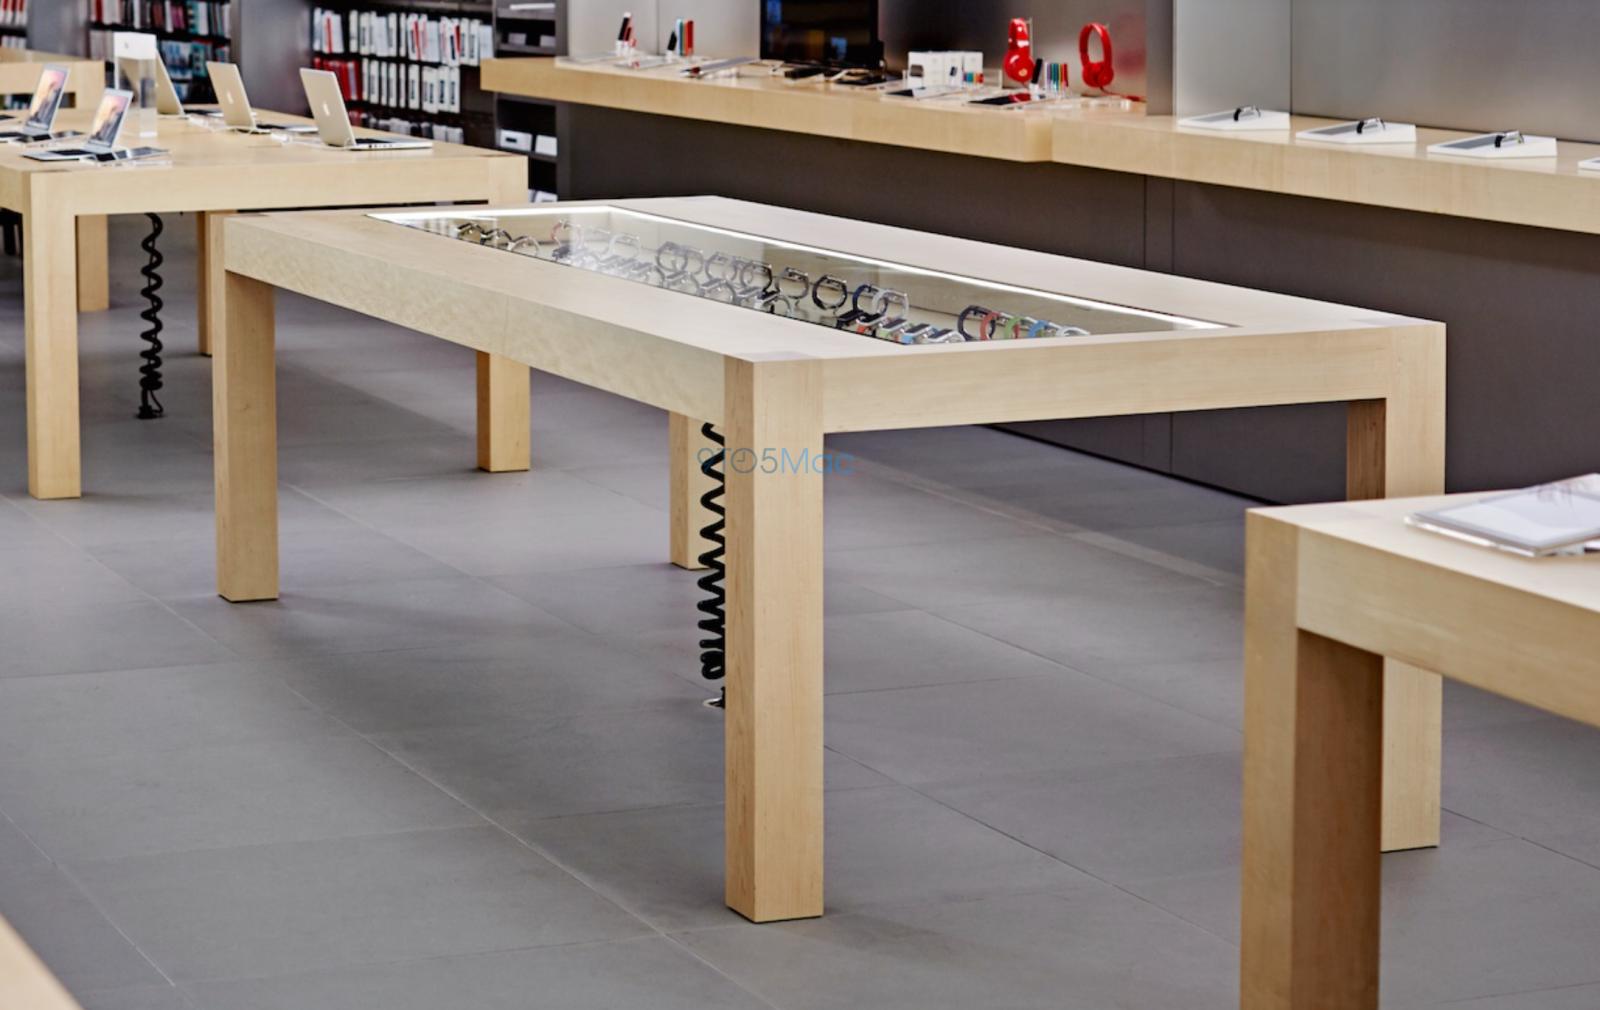 Pin On Apple Store